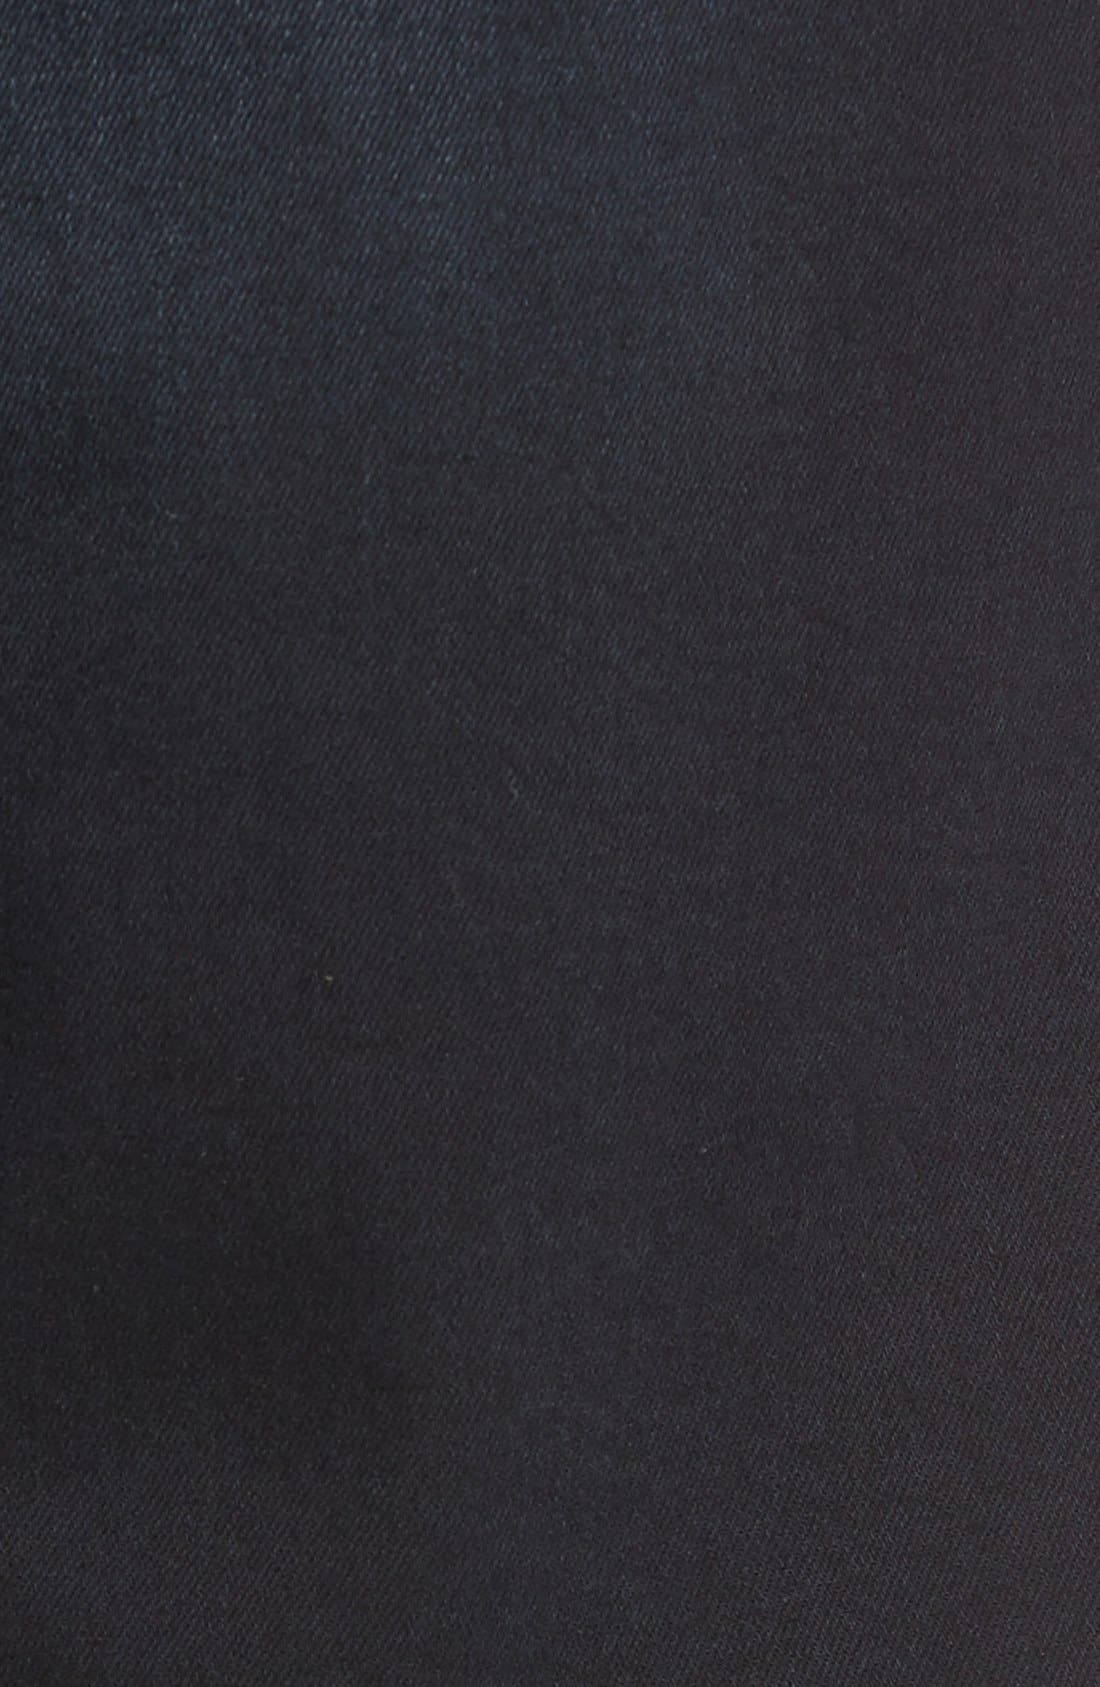 'Myles' Straight Leg Jeans,                             Alternate thumbnail 5, color,                             Ink Brushed Williamsburg